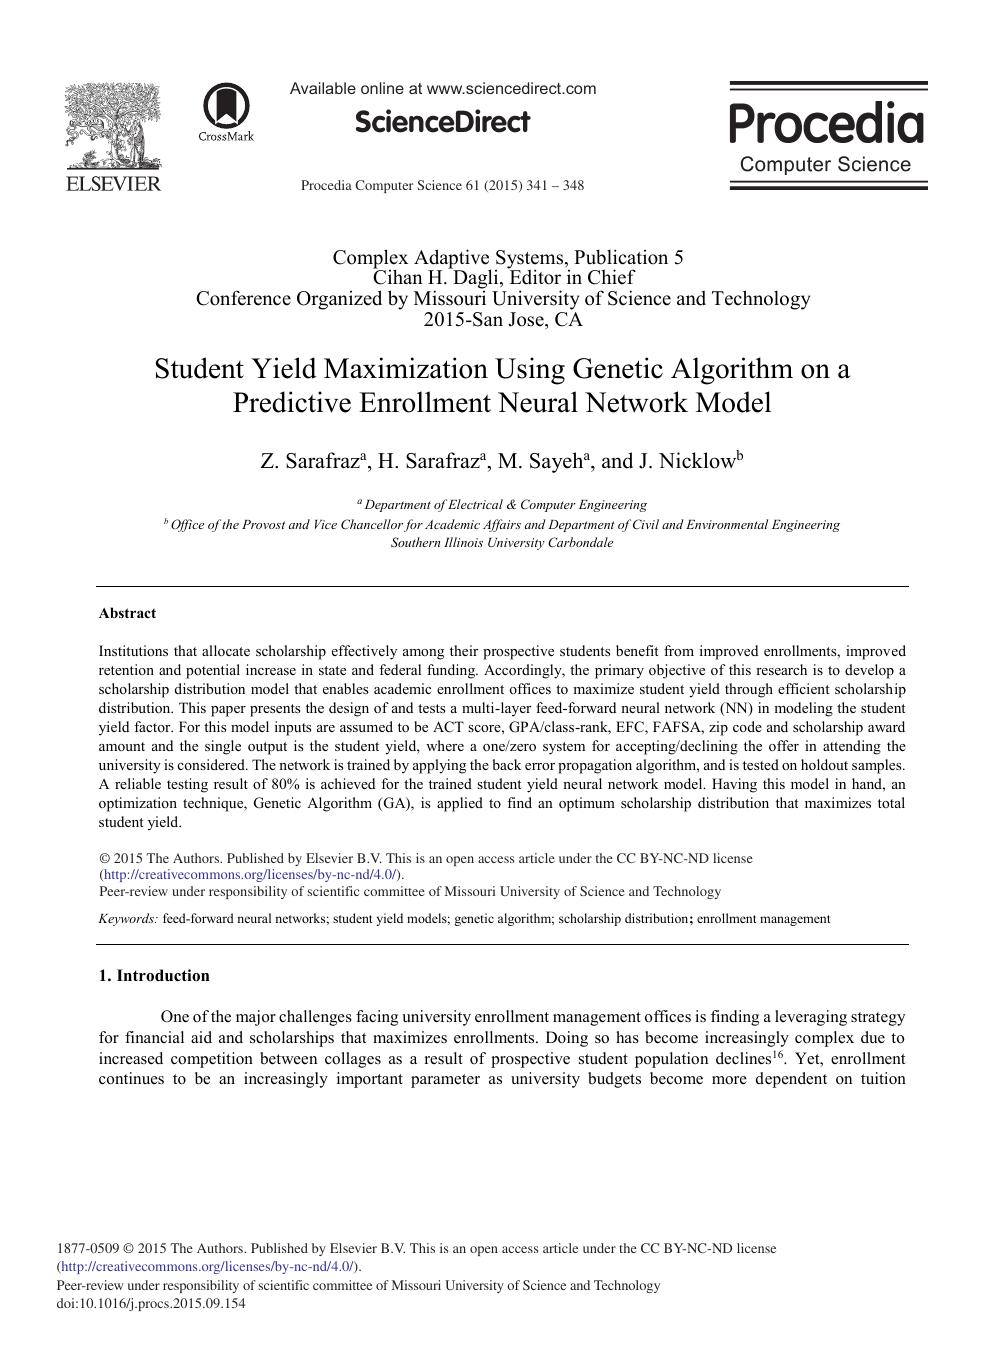 Student Yield Maximization Using Genetic Algorithm on a